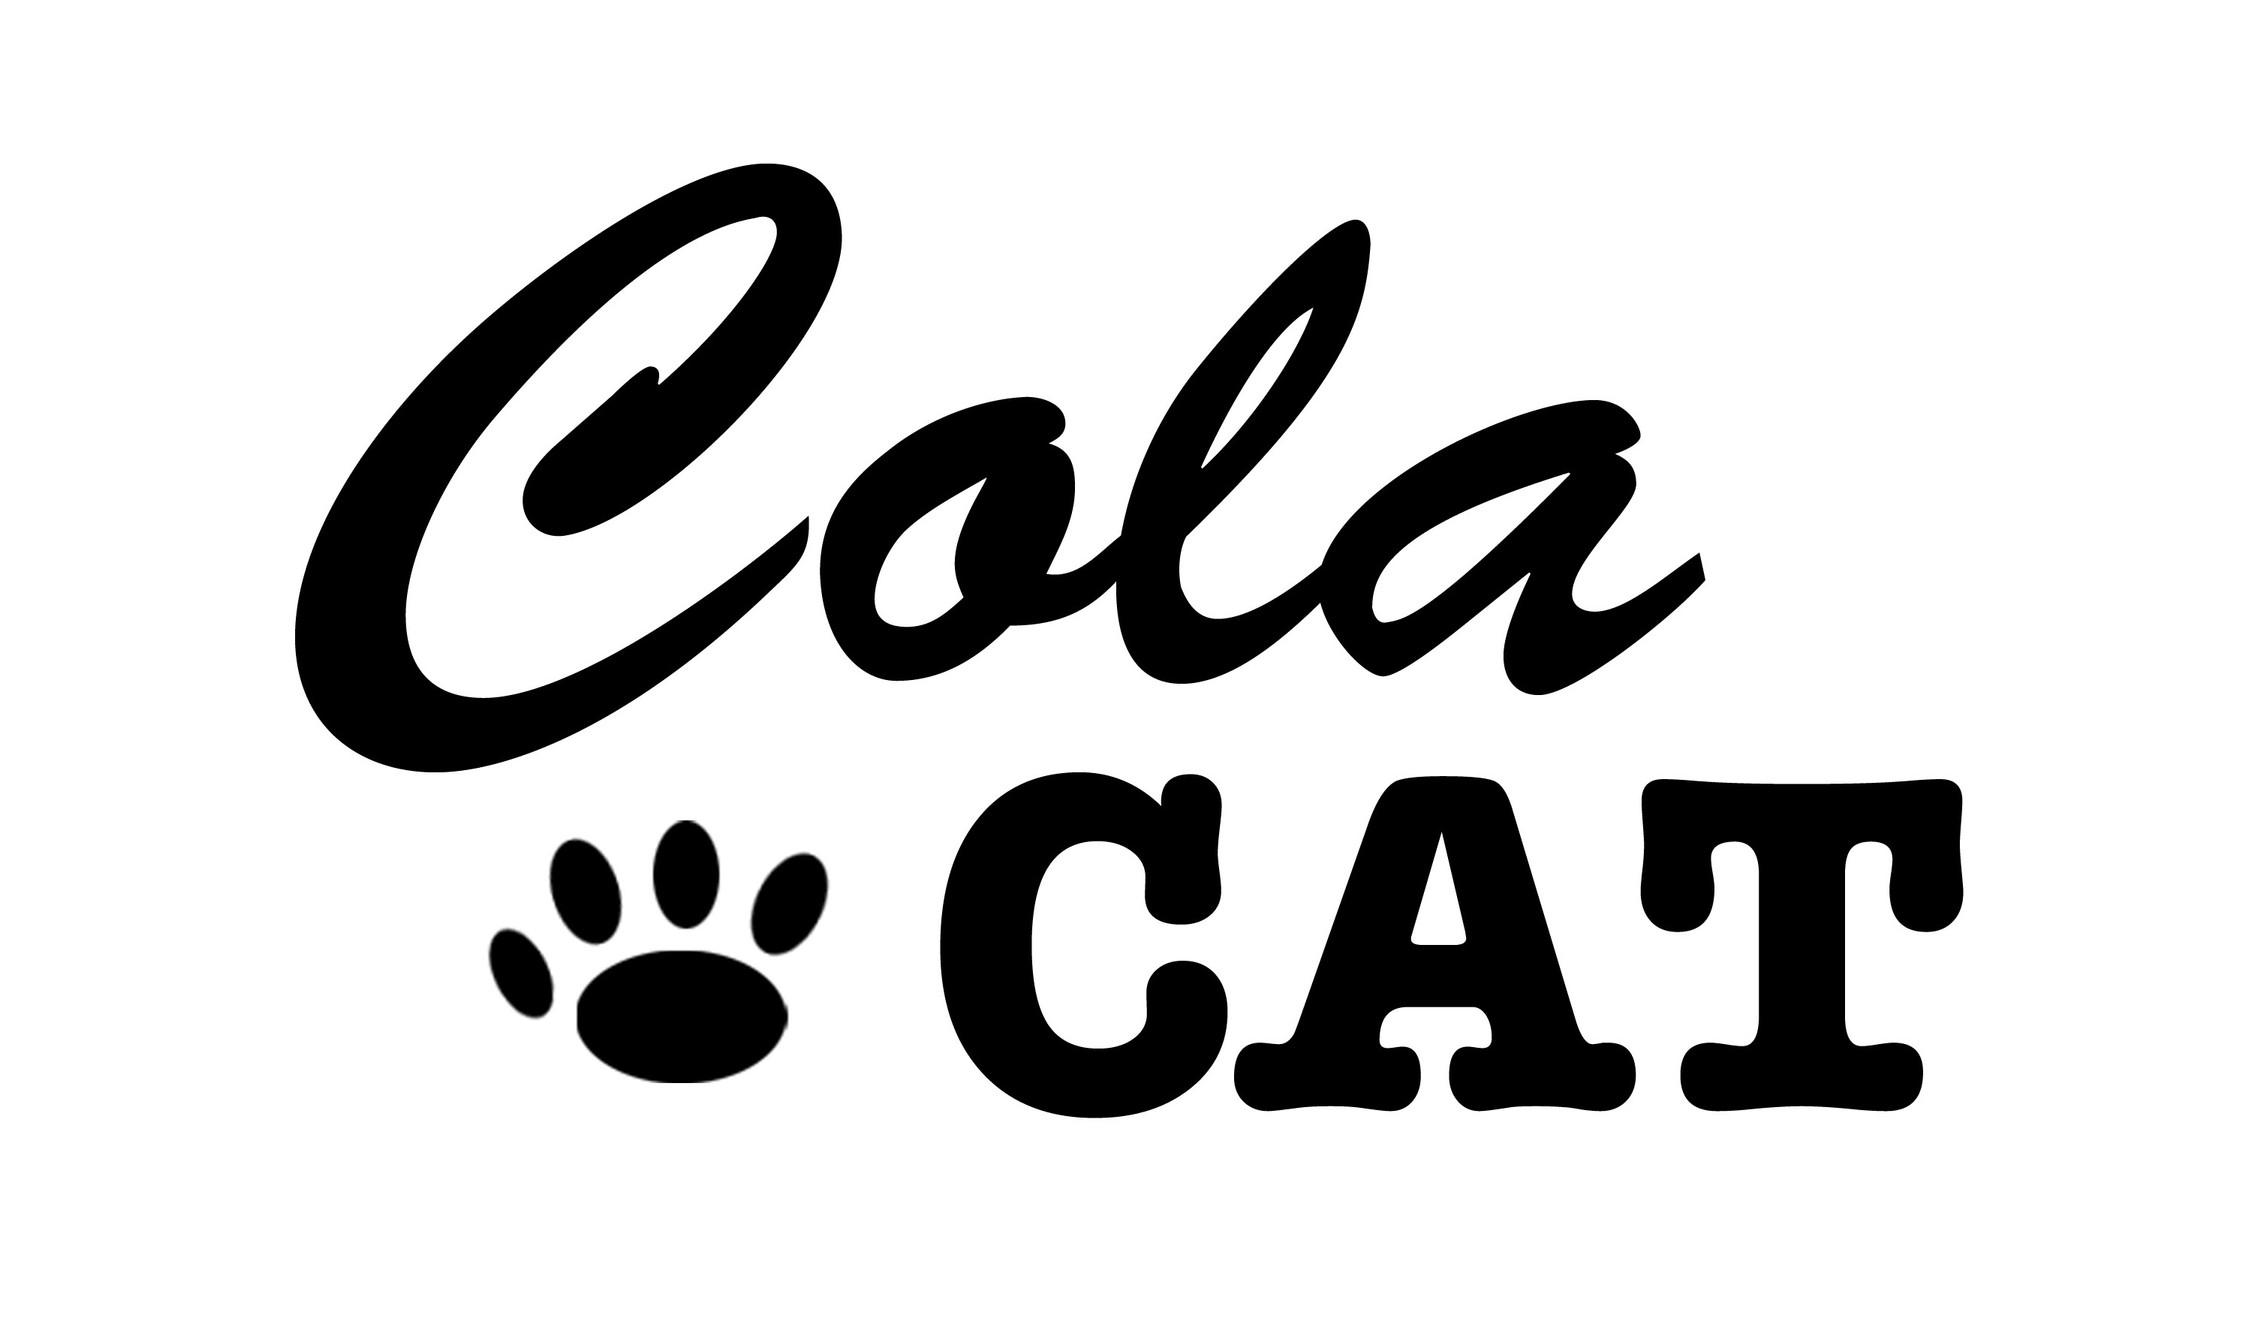 www.colacatlee.com